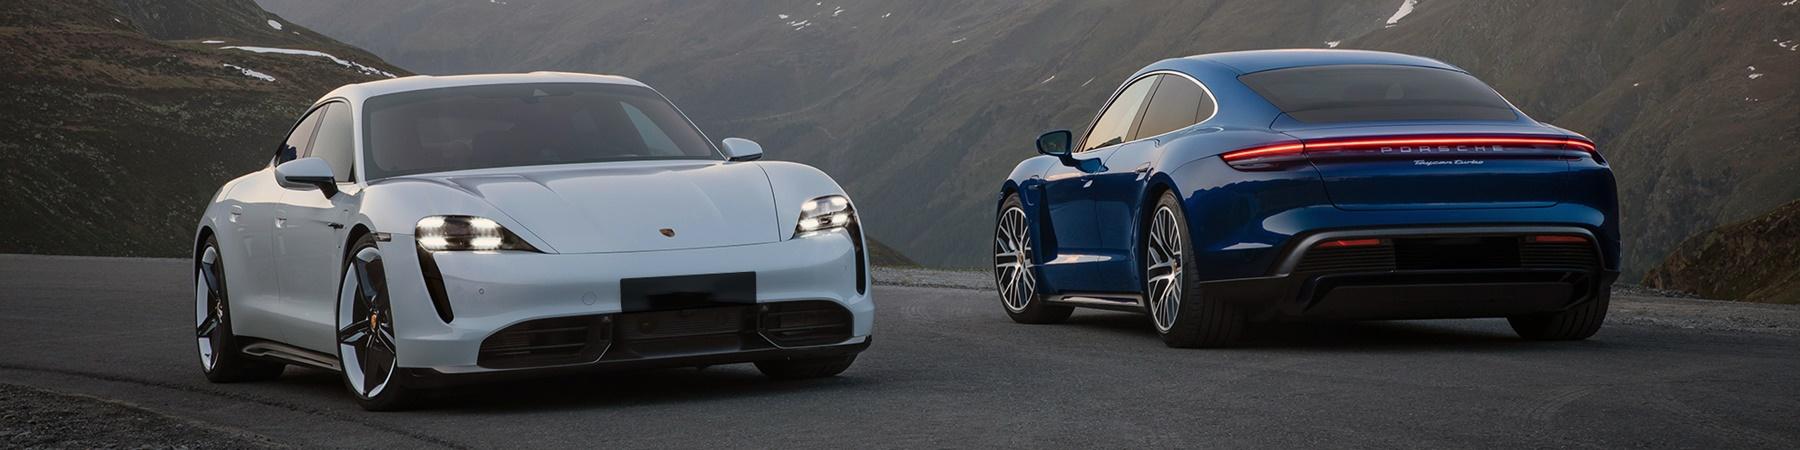 Porsche Taycan 90kWh 315 km actieradius